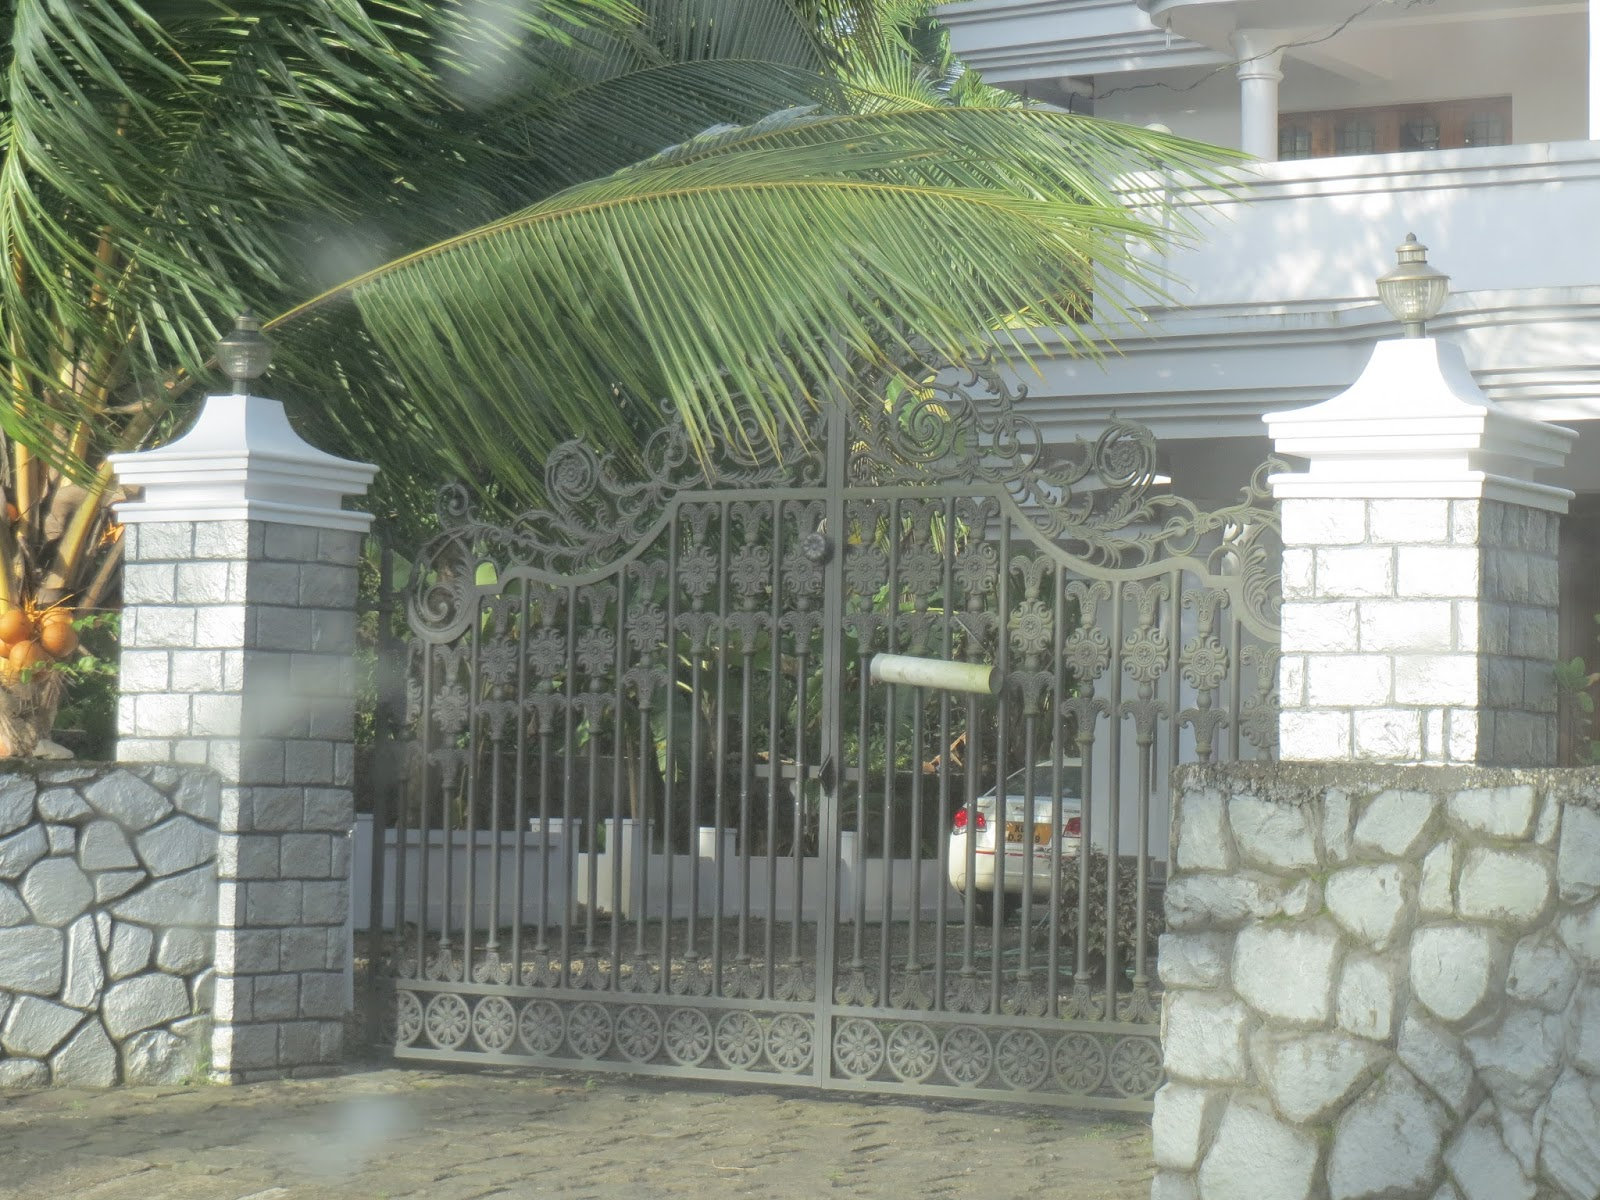 kerala gate designs kerala house gate designs. Black Bedroom Furniture Sets. Home Design Ideas